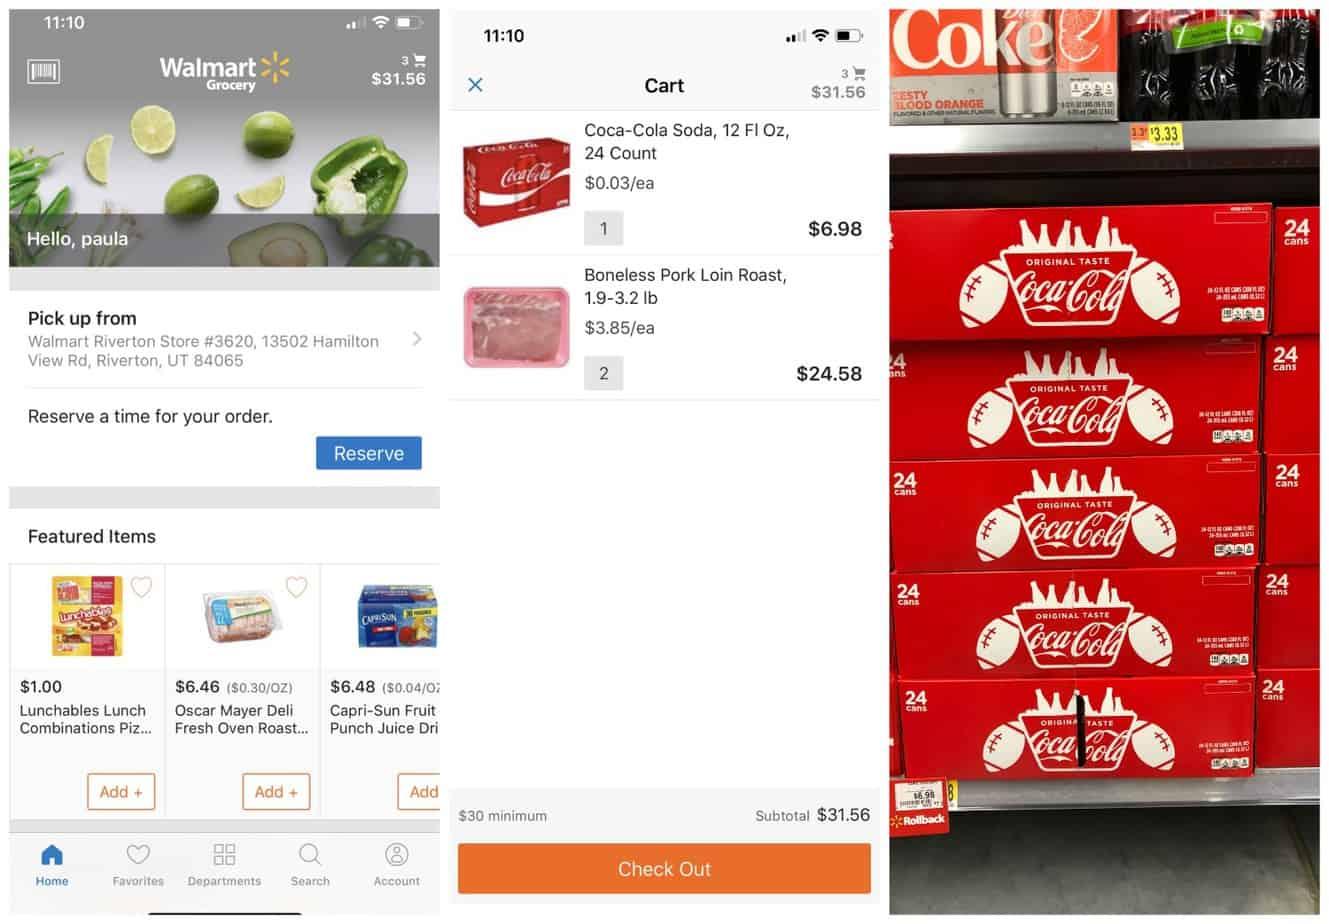 Walmart Grocery Pick Up Coca Cola Pulled Pork Sliders | www.housewivesofriverton.com